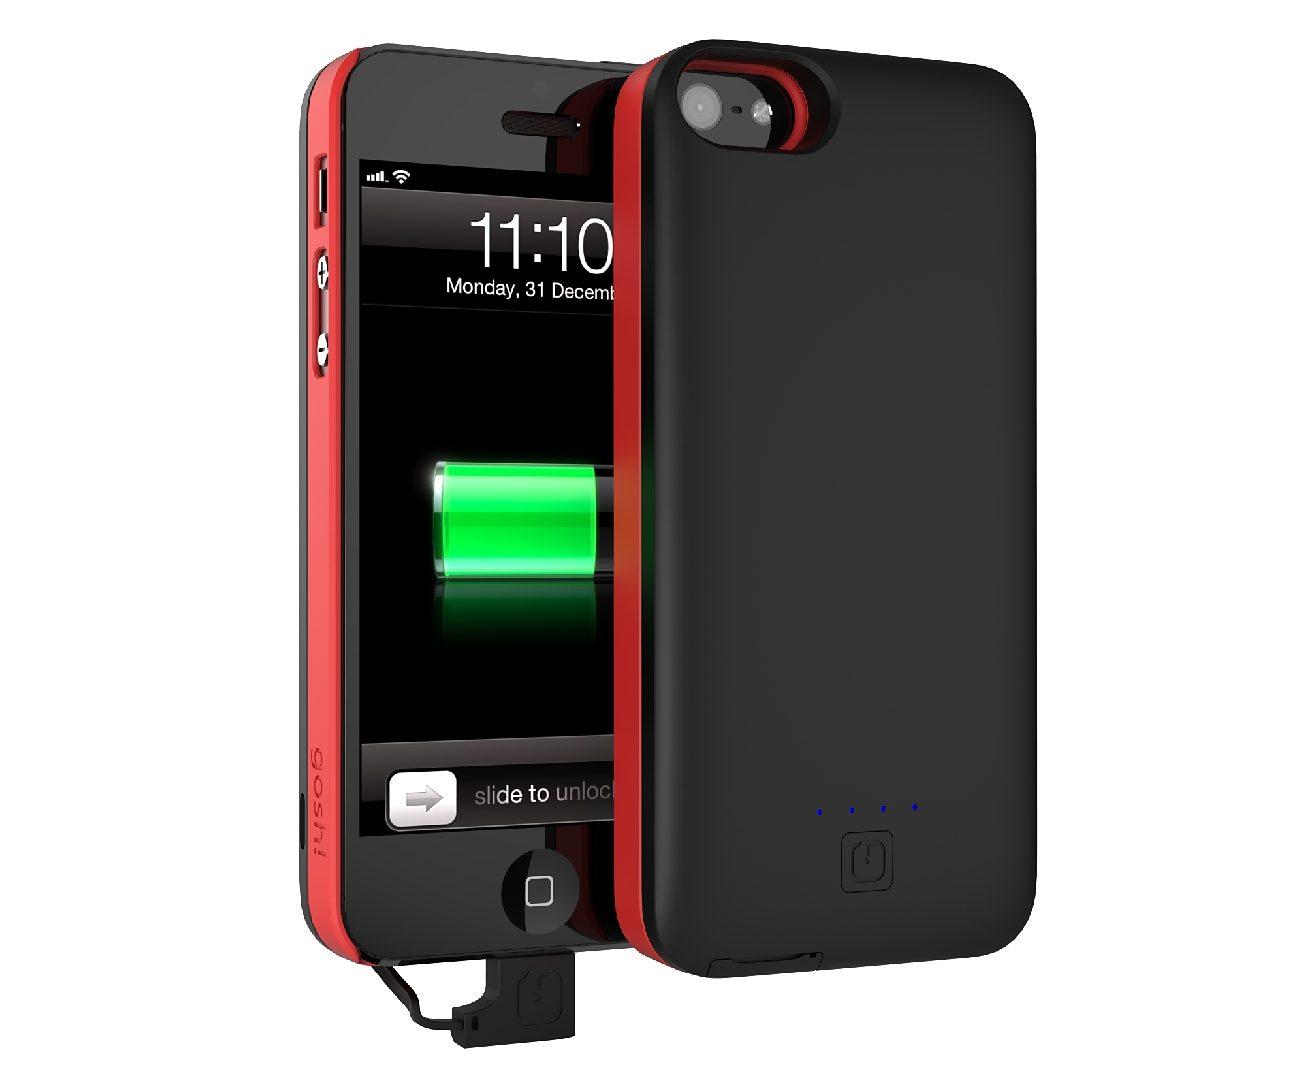 GOSH Schutzhülle mit Akku »Parallel 2500 mAh iPhone 5/5S Schwarz/Rot«